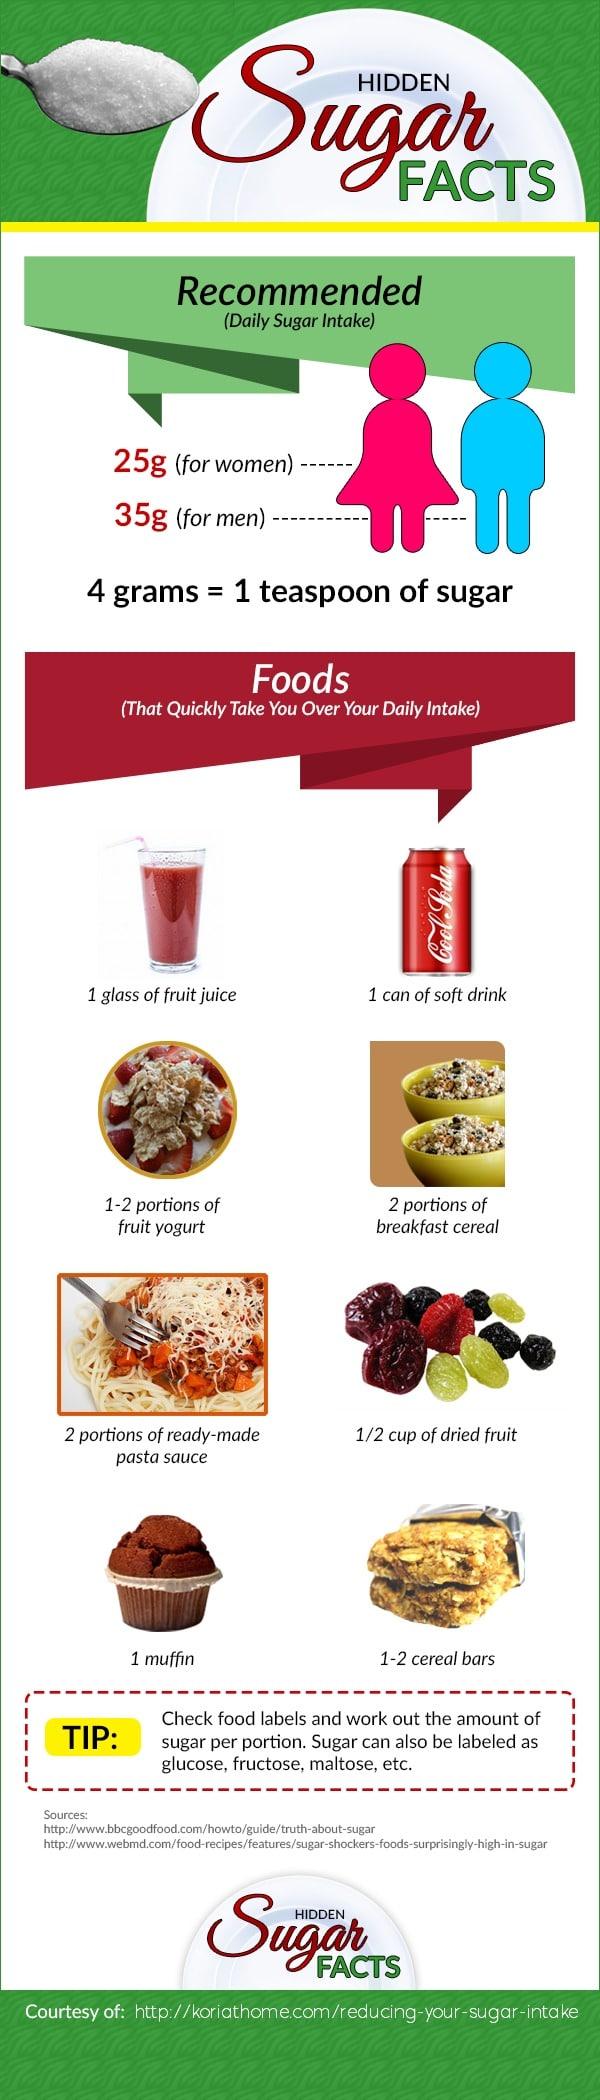 How to Start Reducing Your Sugar Intake 2